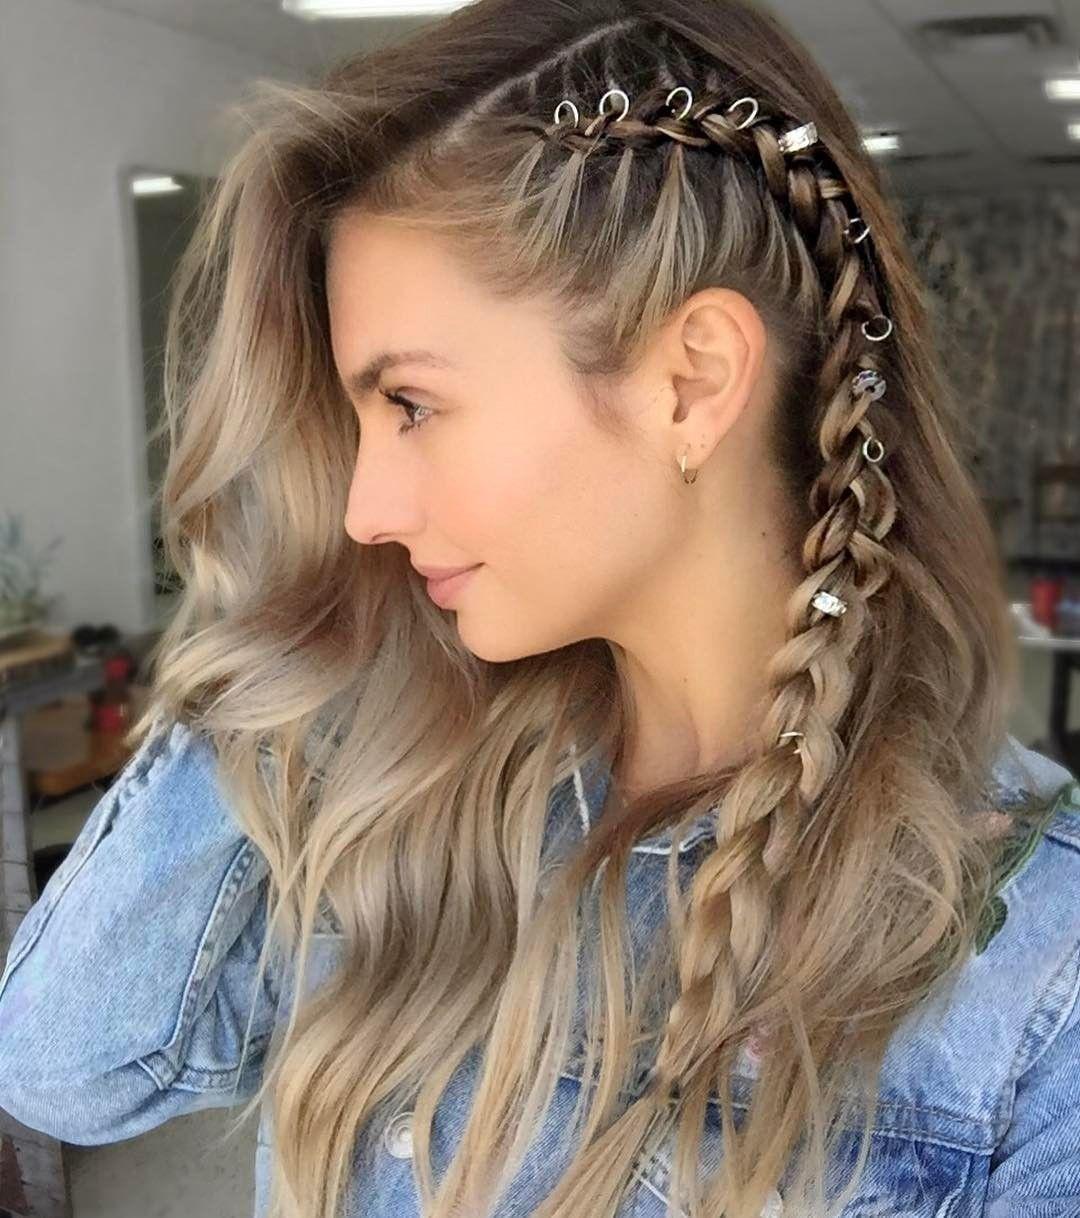 Acogedor peinados con trenza para boda Galeria De Cortes De Pelo Tendencias - 15 Peinados con trenzas que serán tus favoritos este verano